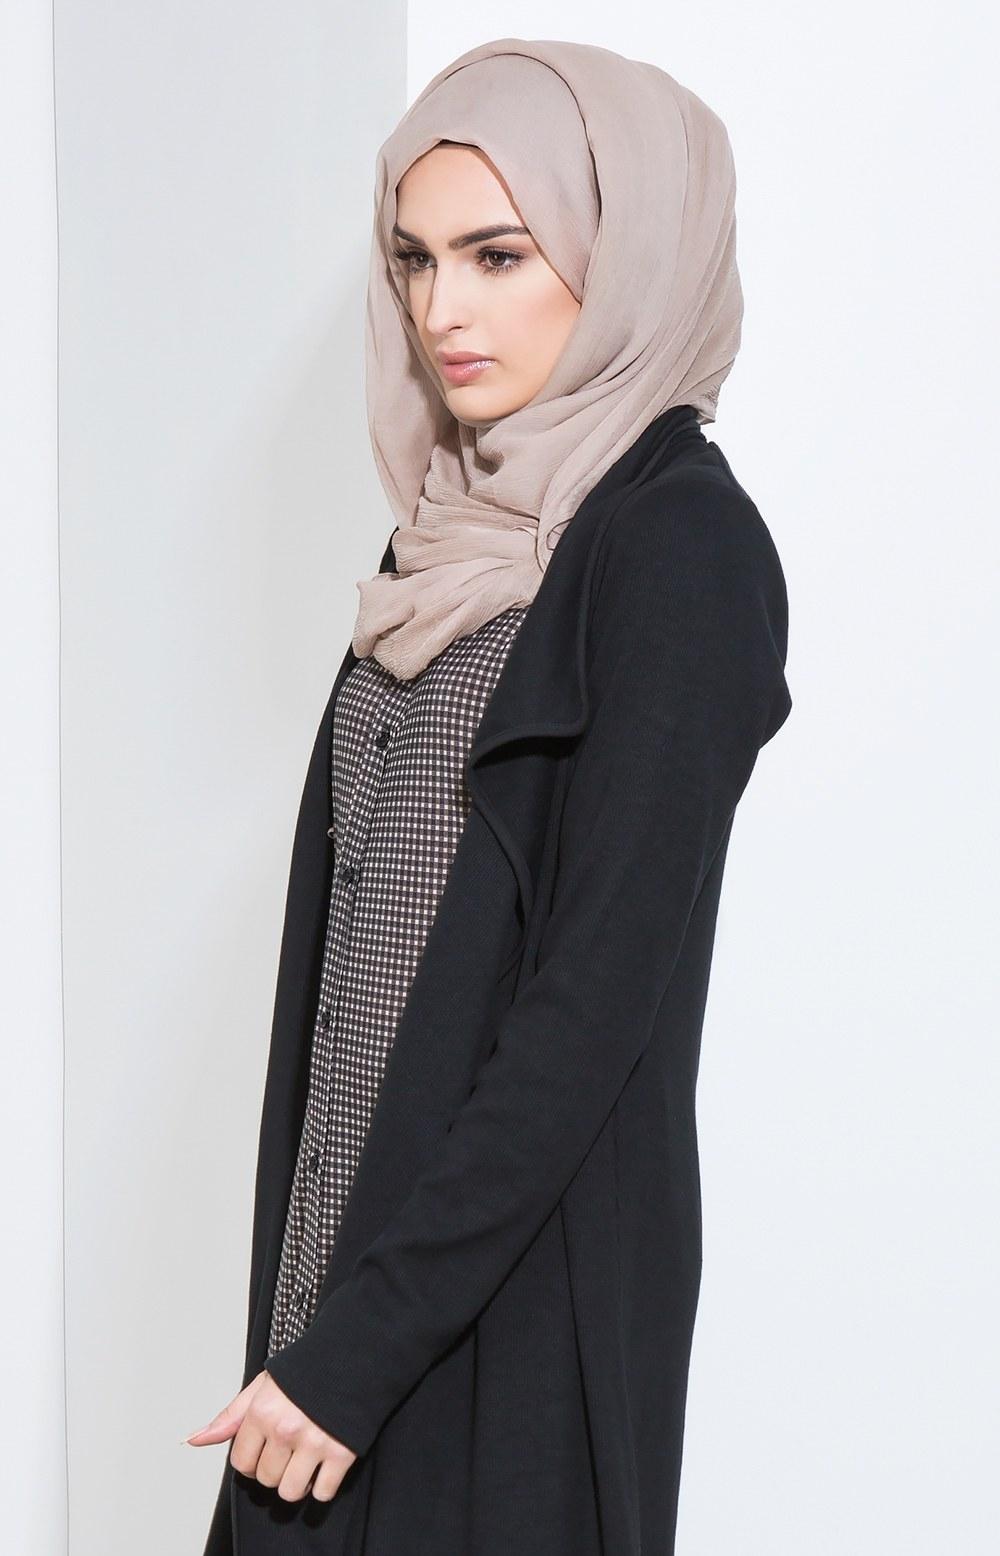 Bentuk Model Baju Lebaran atas Bawah Y7du 25 Trend Model Baju Muslim Lebaran 2018 Simple & Modis